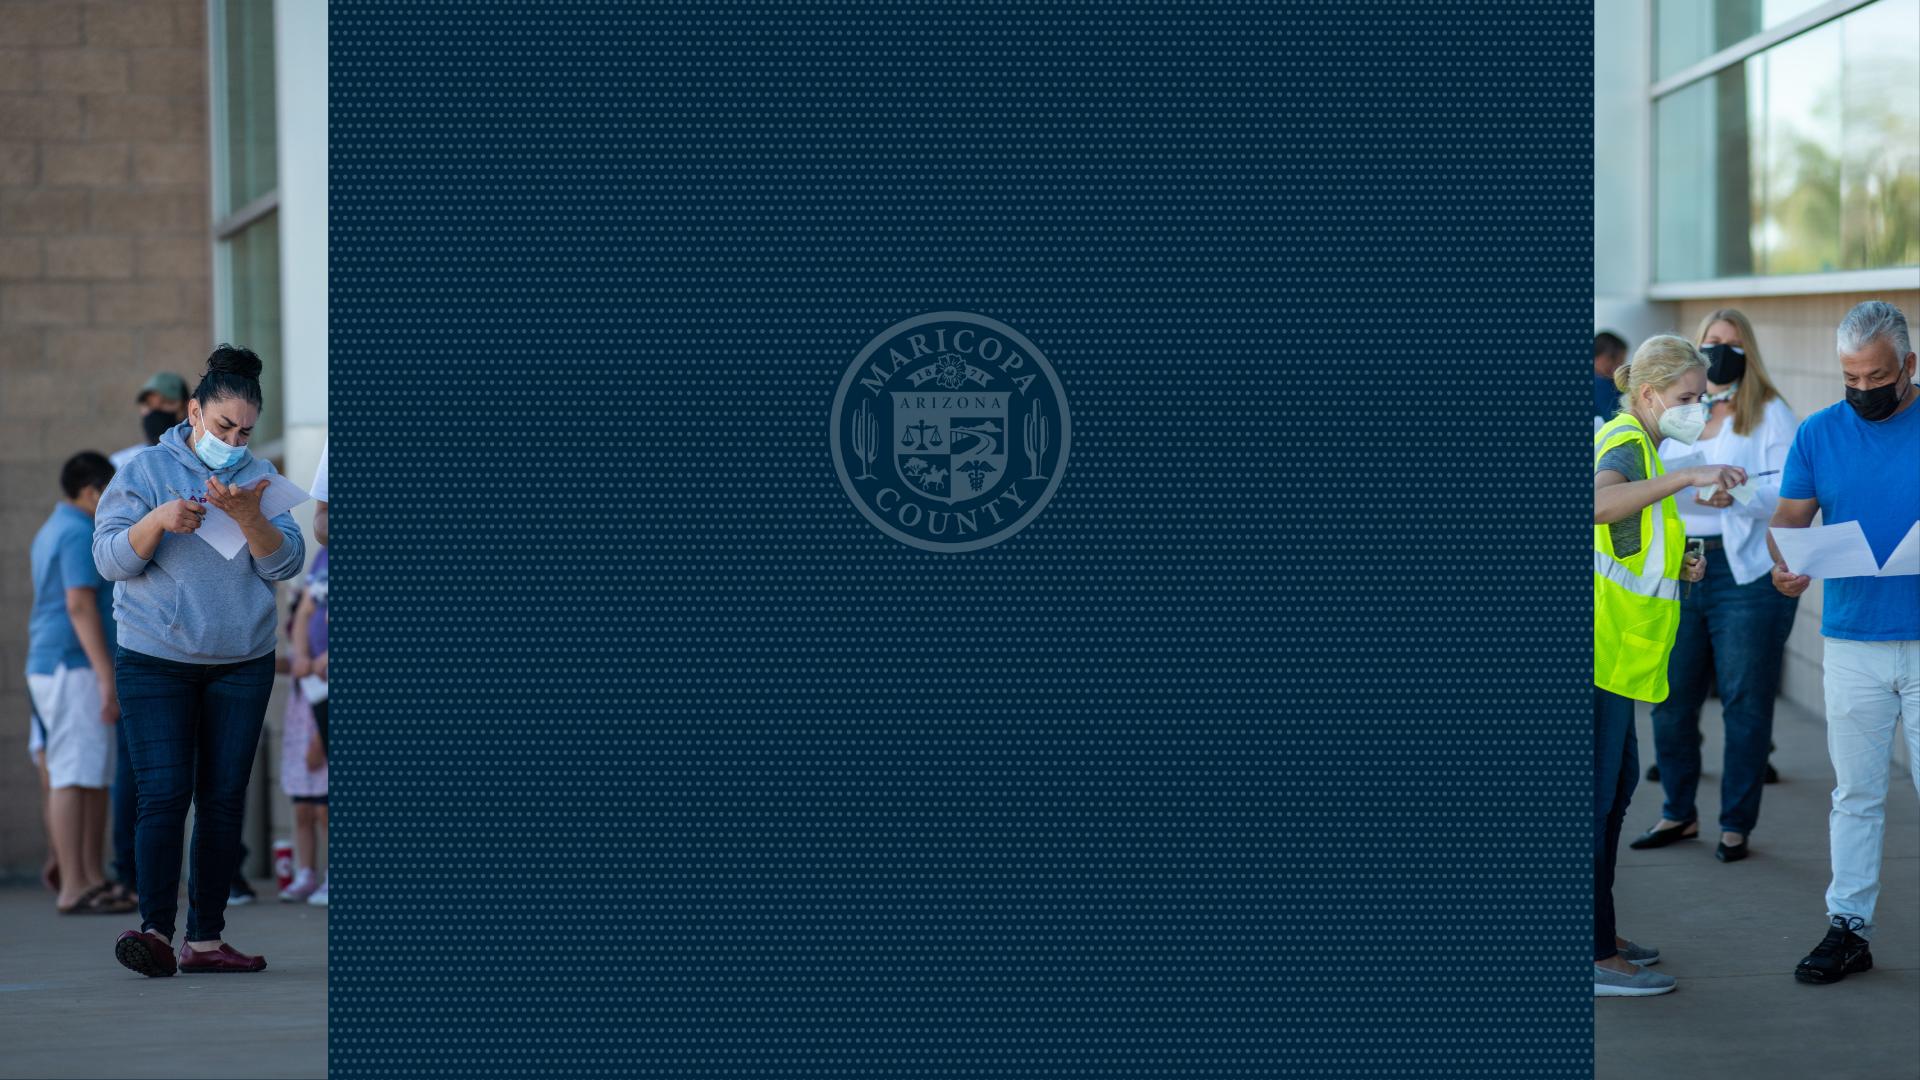 https://cdn.flow.page/images/4edc25f4-dee0-48a5-99ec-1cd3dde4cfa5-background?m=1620150386